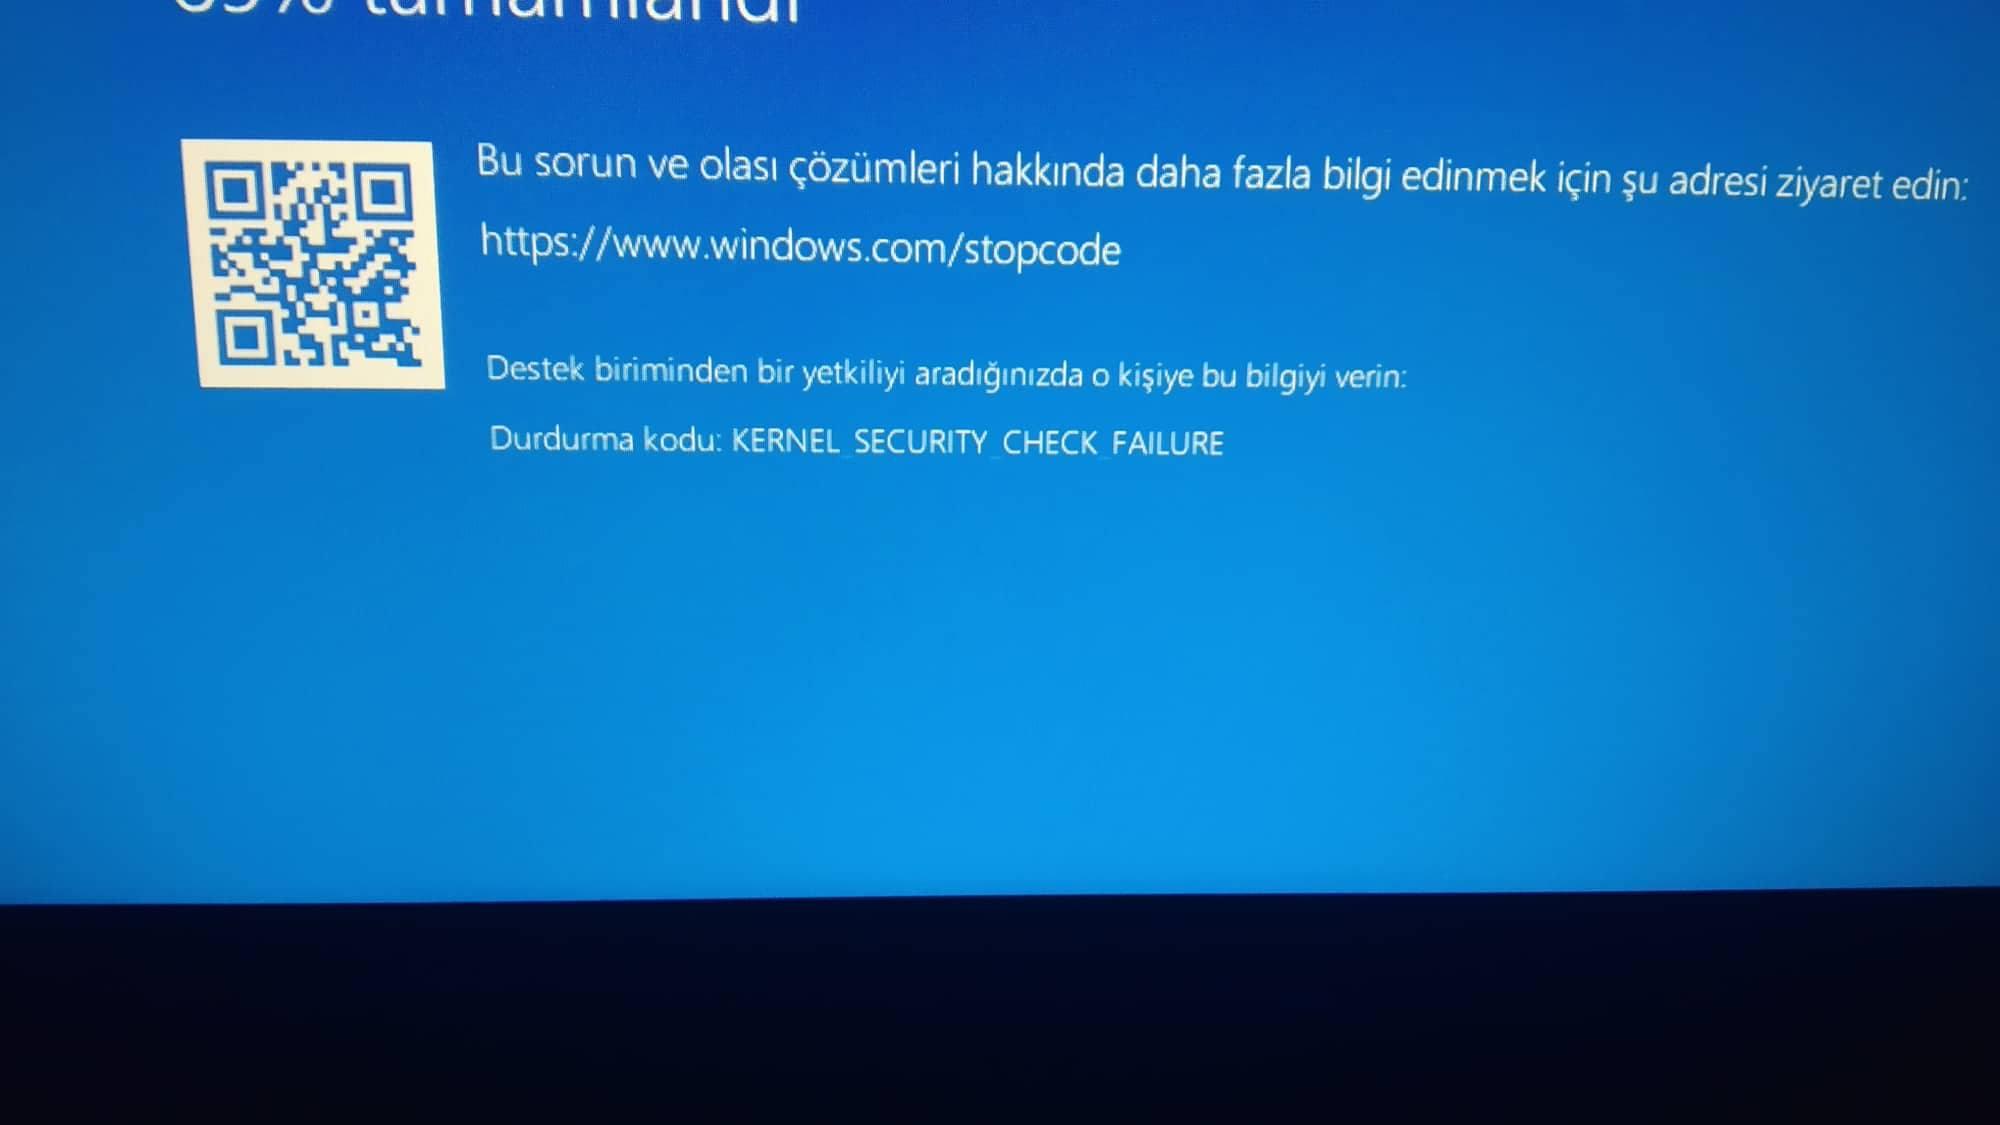 windows stop code kernel security check failure